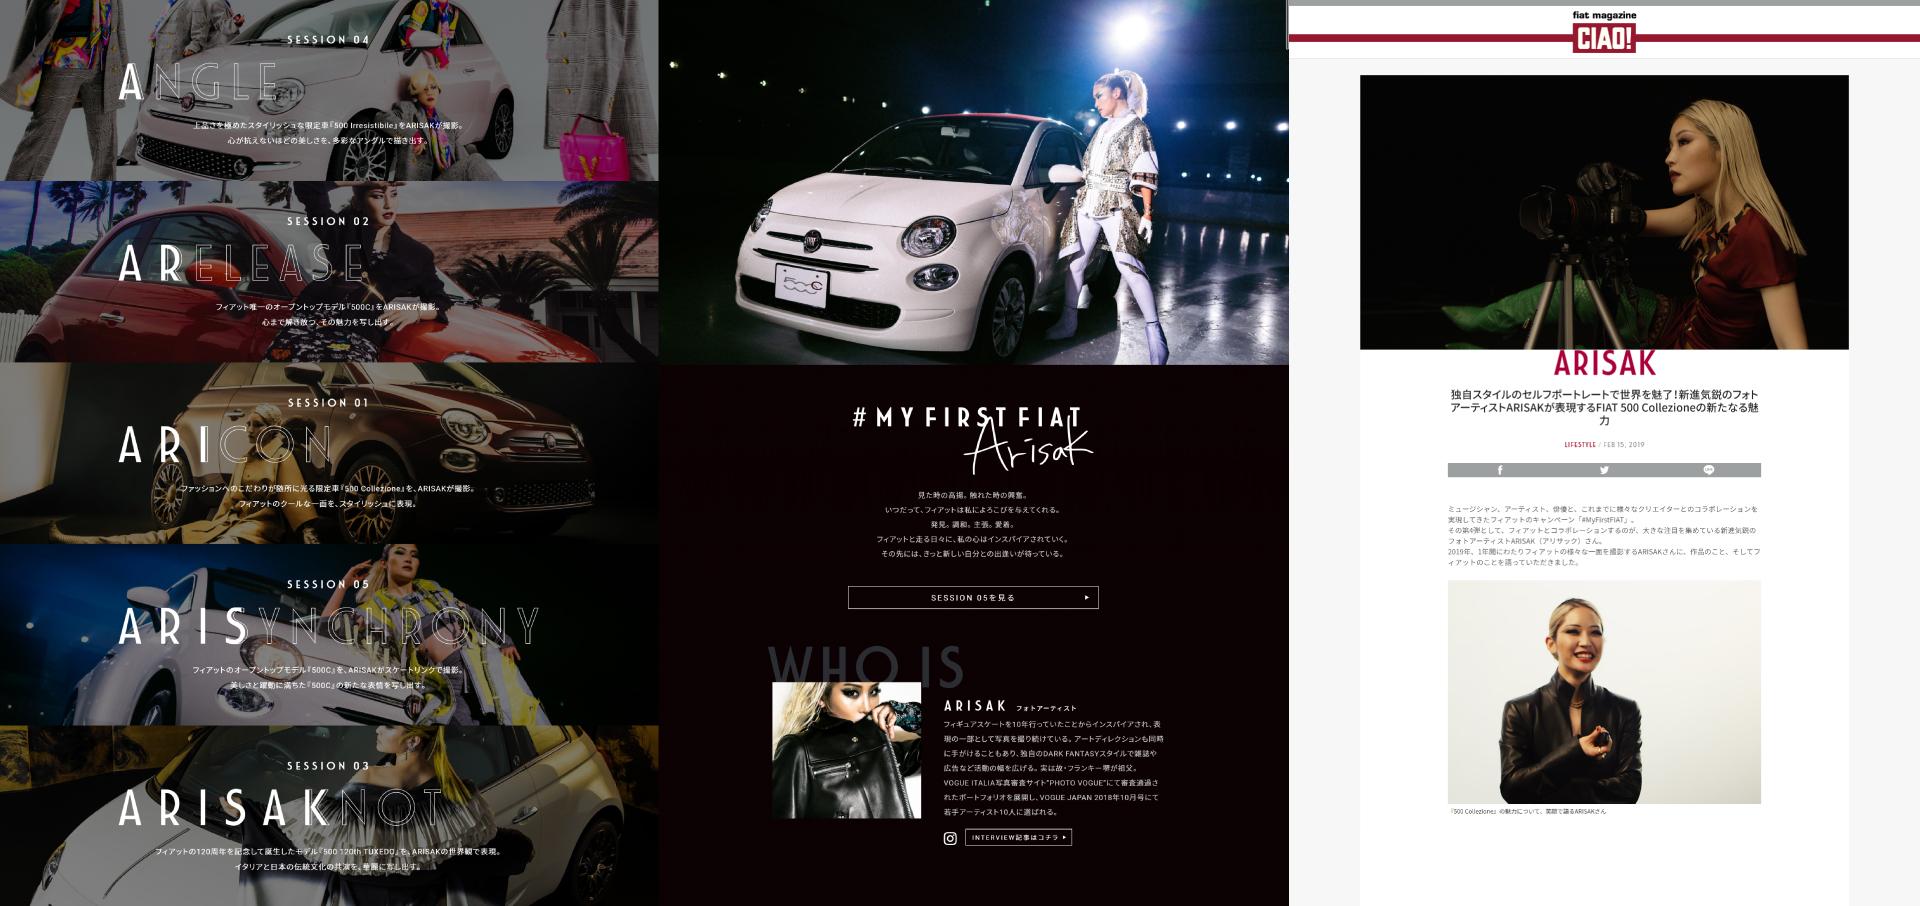 My First Fiat – Arisak-featured-image